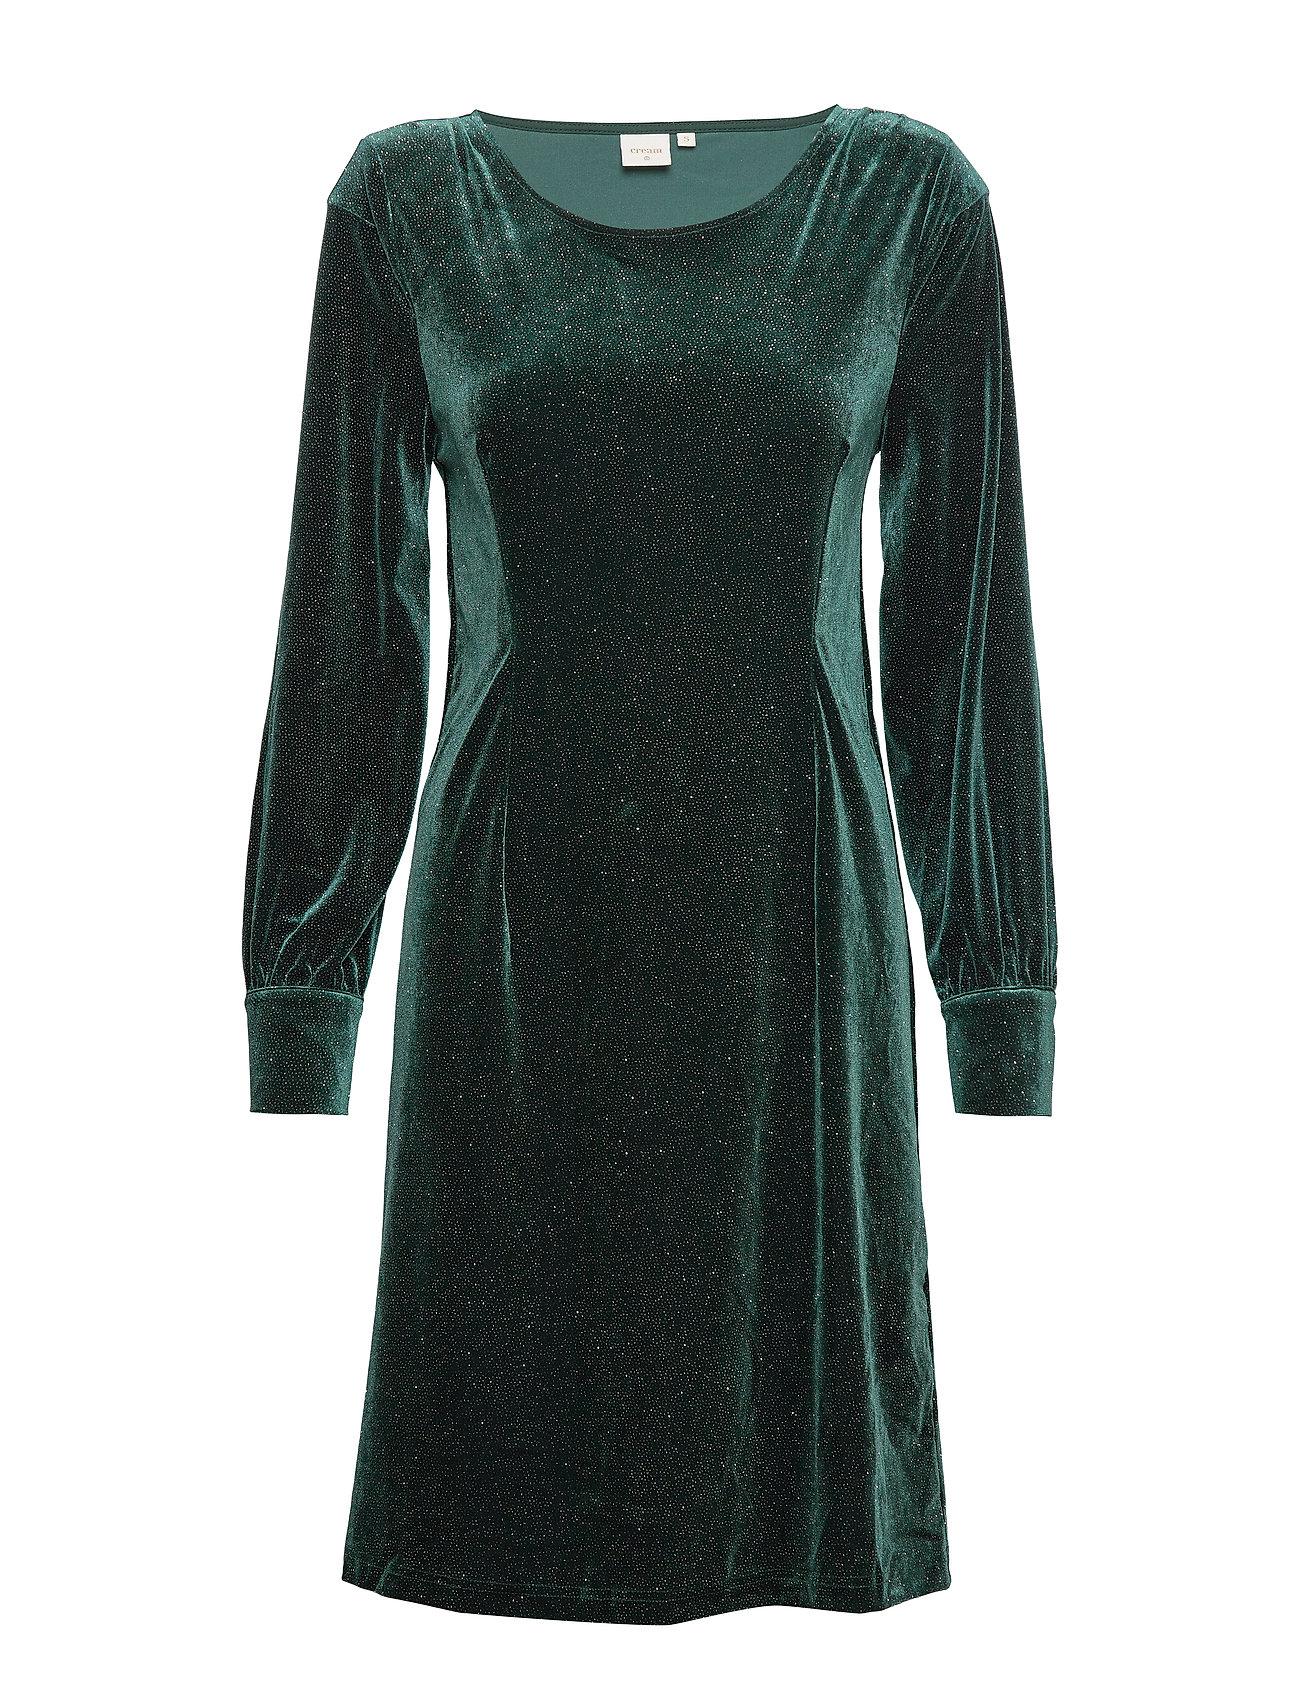 Cream OliveCR Dress - DEEP GREEN